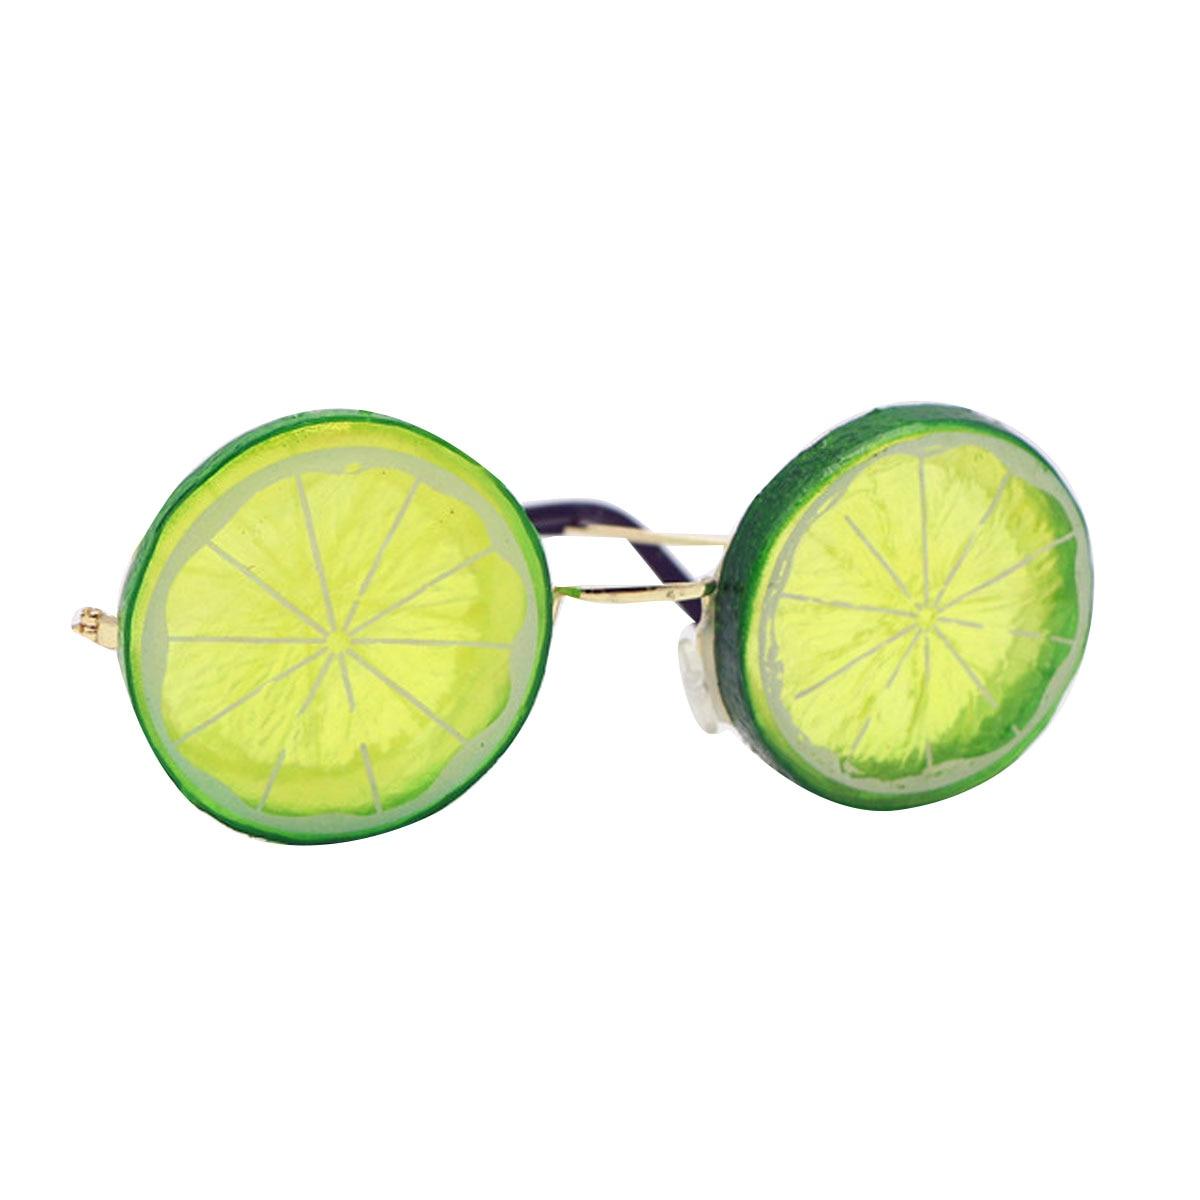 Creative Lemon Shaped Eyeglasses Photography Props Beach Wedding Photography Lemon Glasses Photos Props Funny Party Glasses